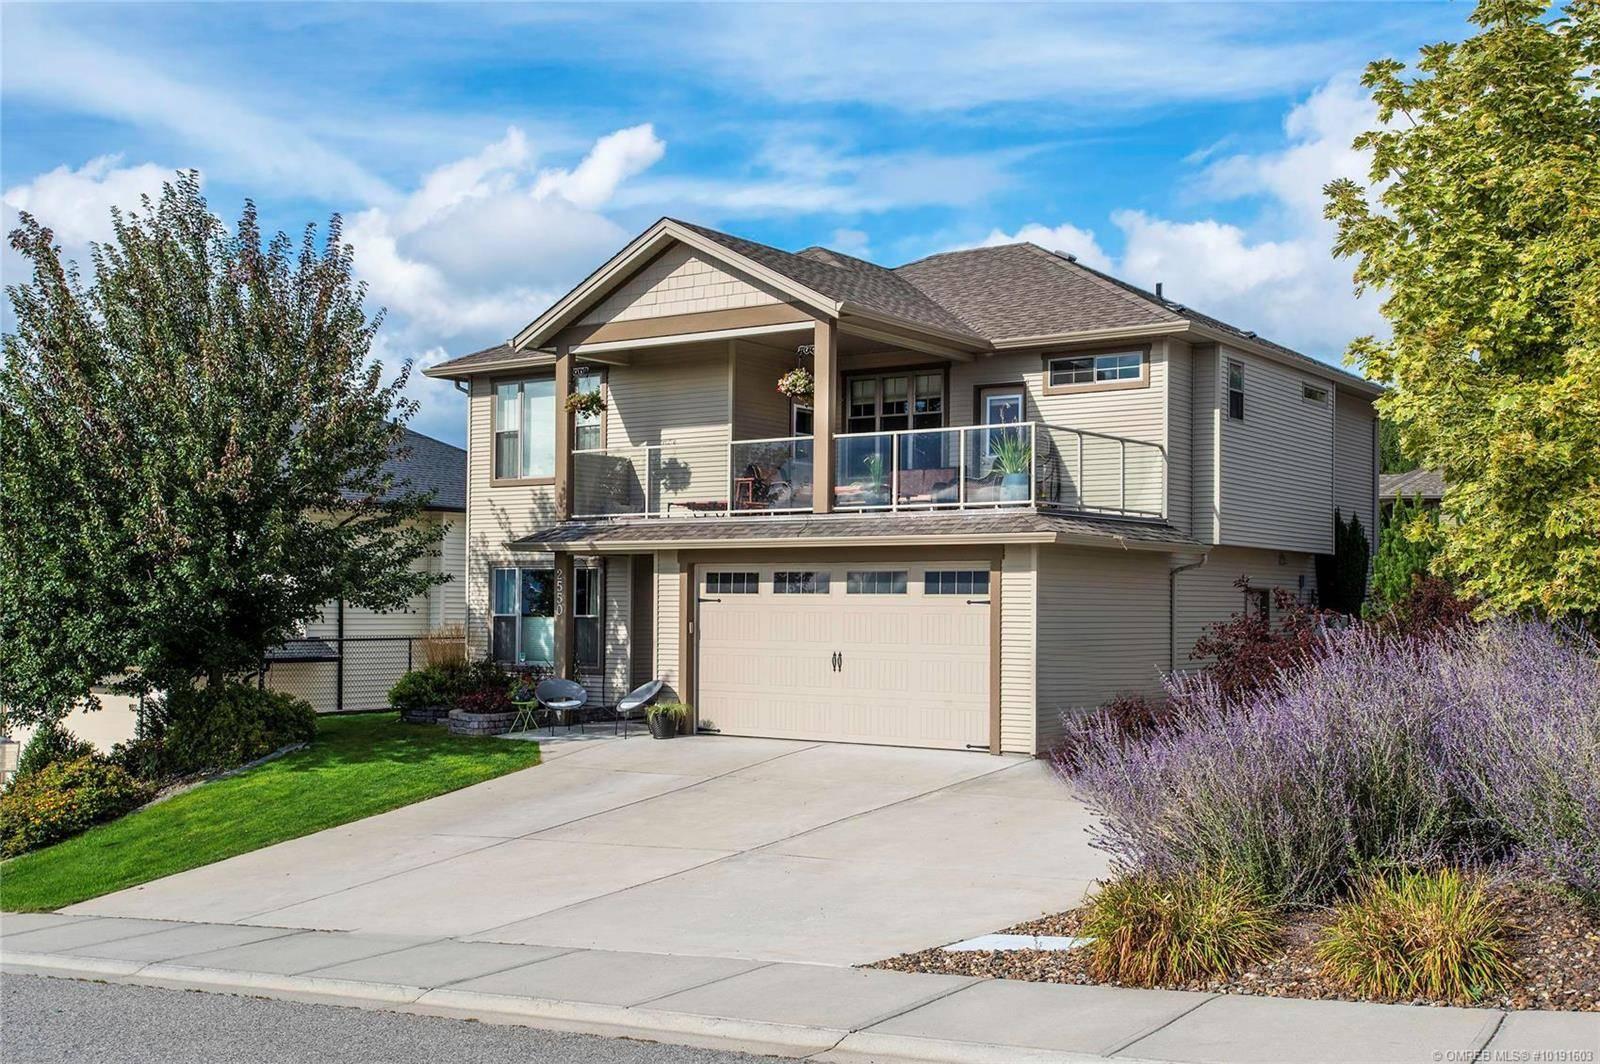 House for sale at 2550 Copper Ridge Dr West Kelowna British Columbia - MLS: 10191603